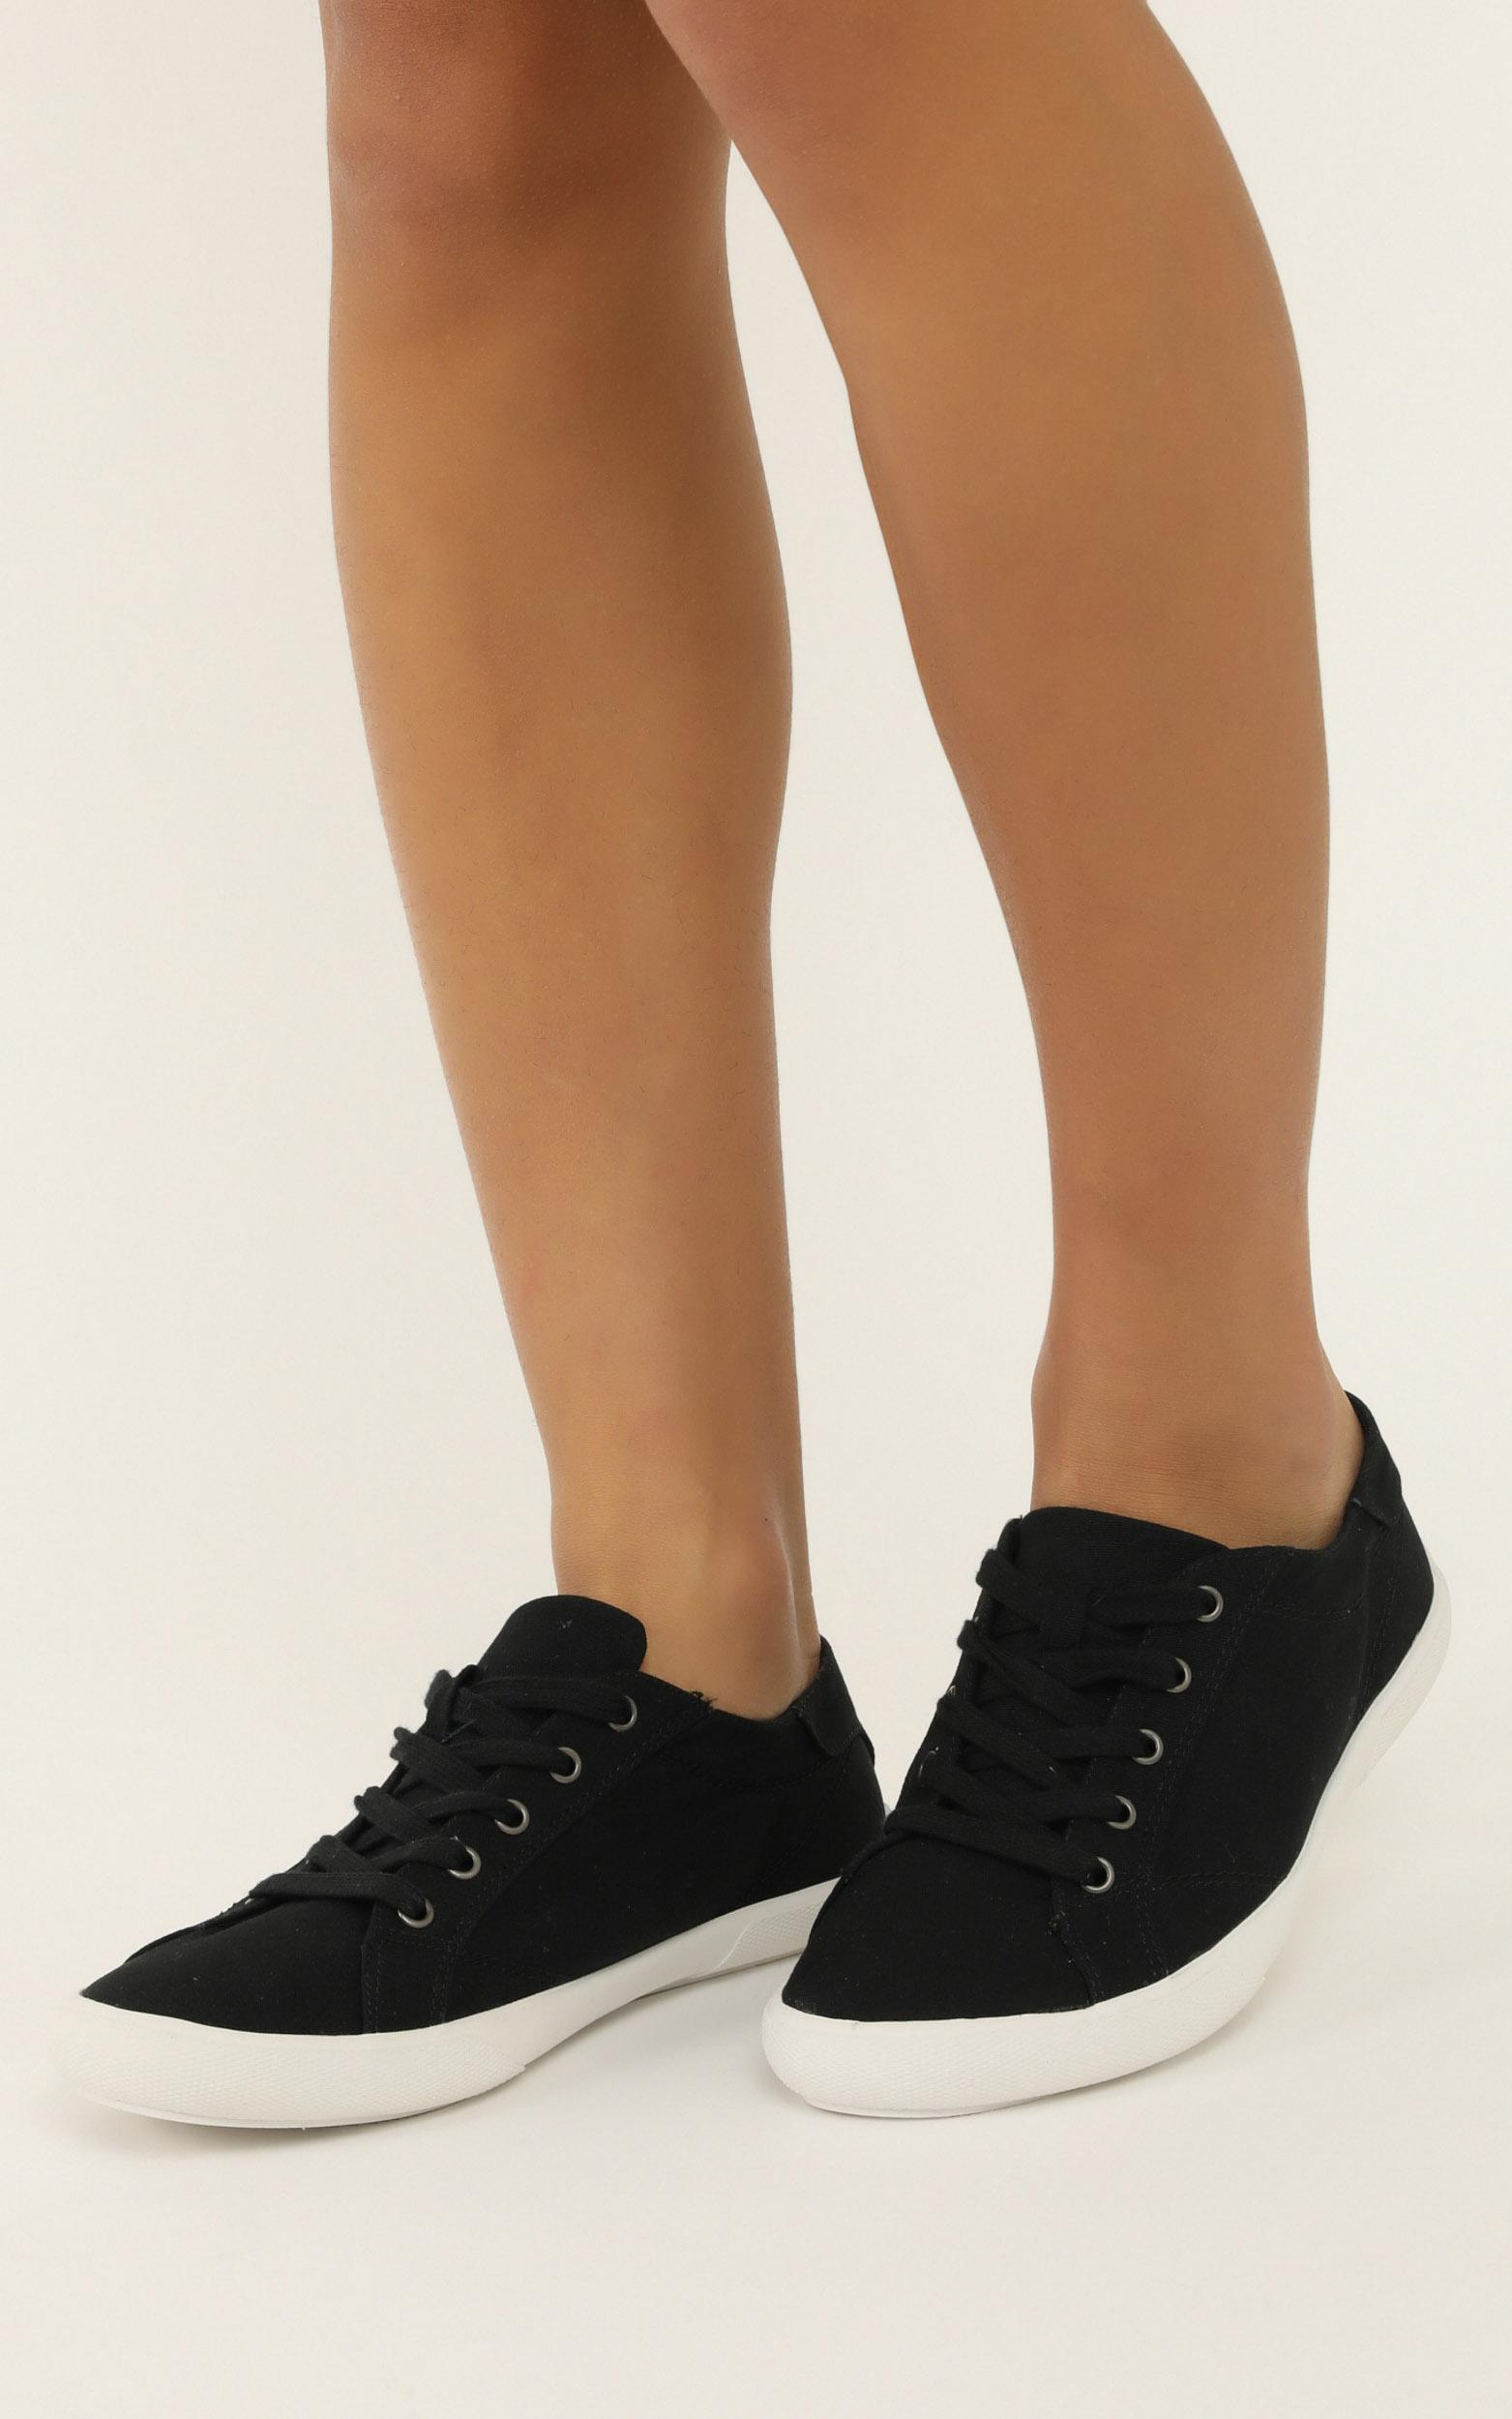 Verali - Retro Sneakers in black canvas - 10, Black, hi-res image number null